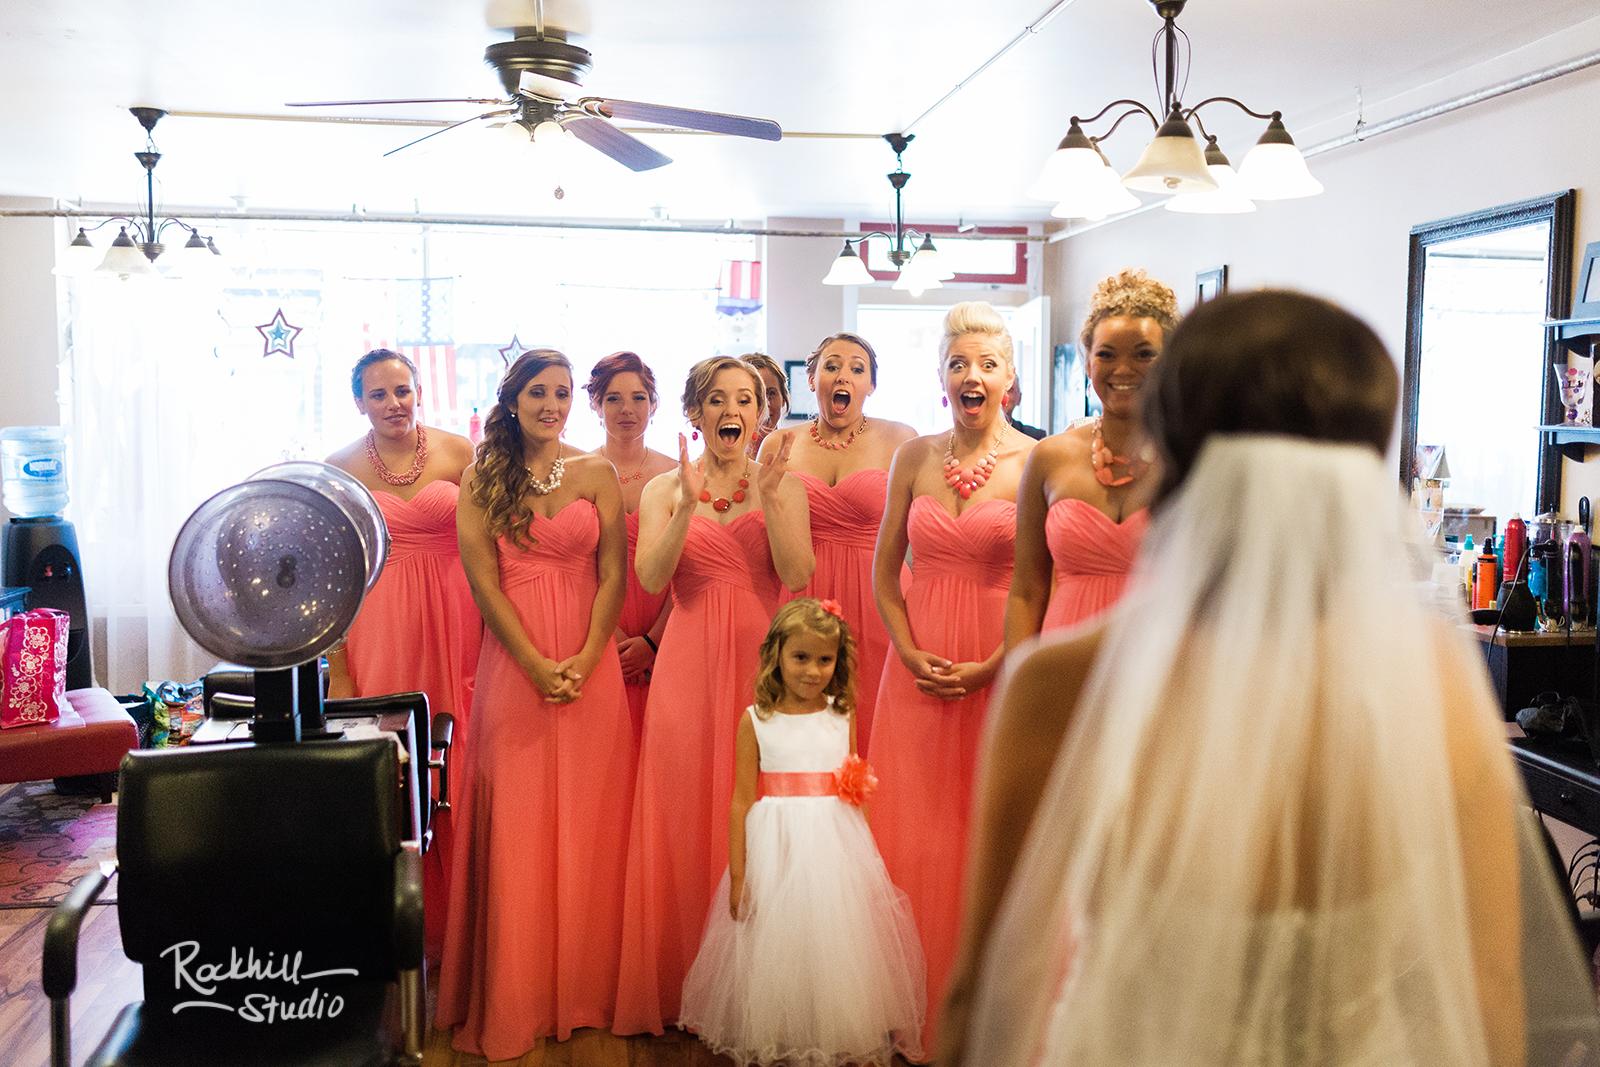 marquette-wedding-upper-peninsula-northern-michigan-wedding-ck-photography-salon-3.jpg